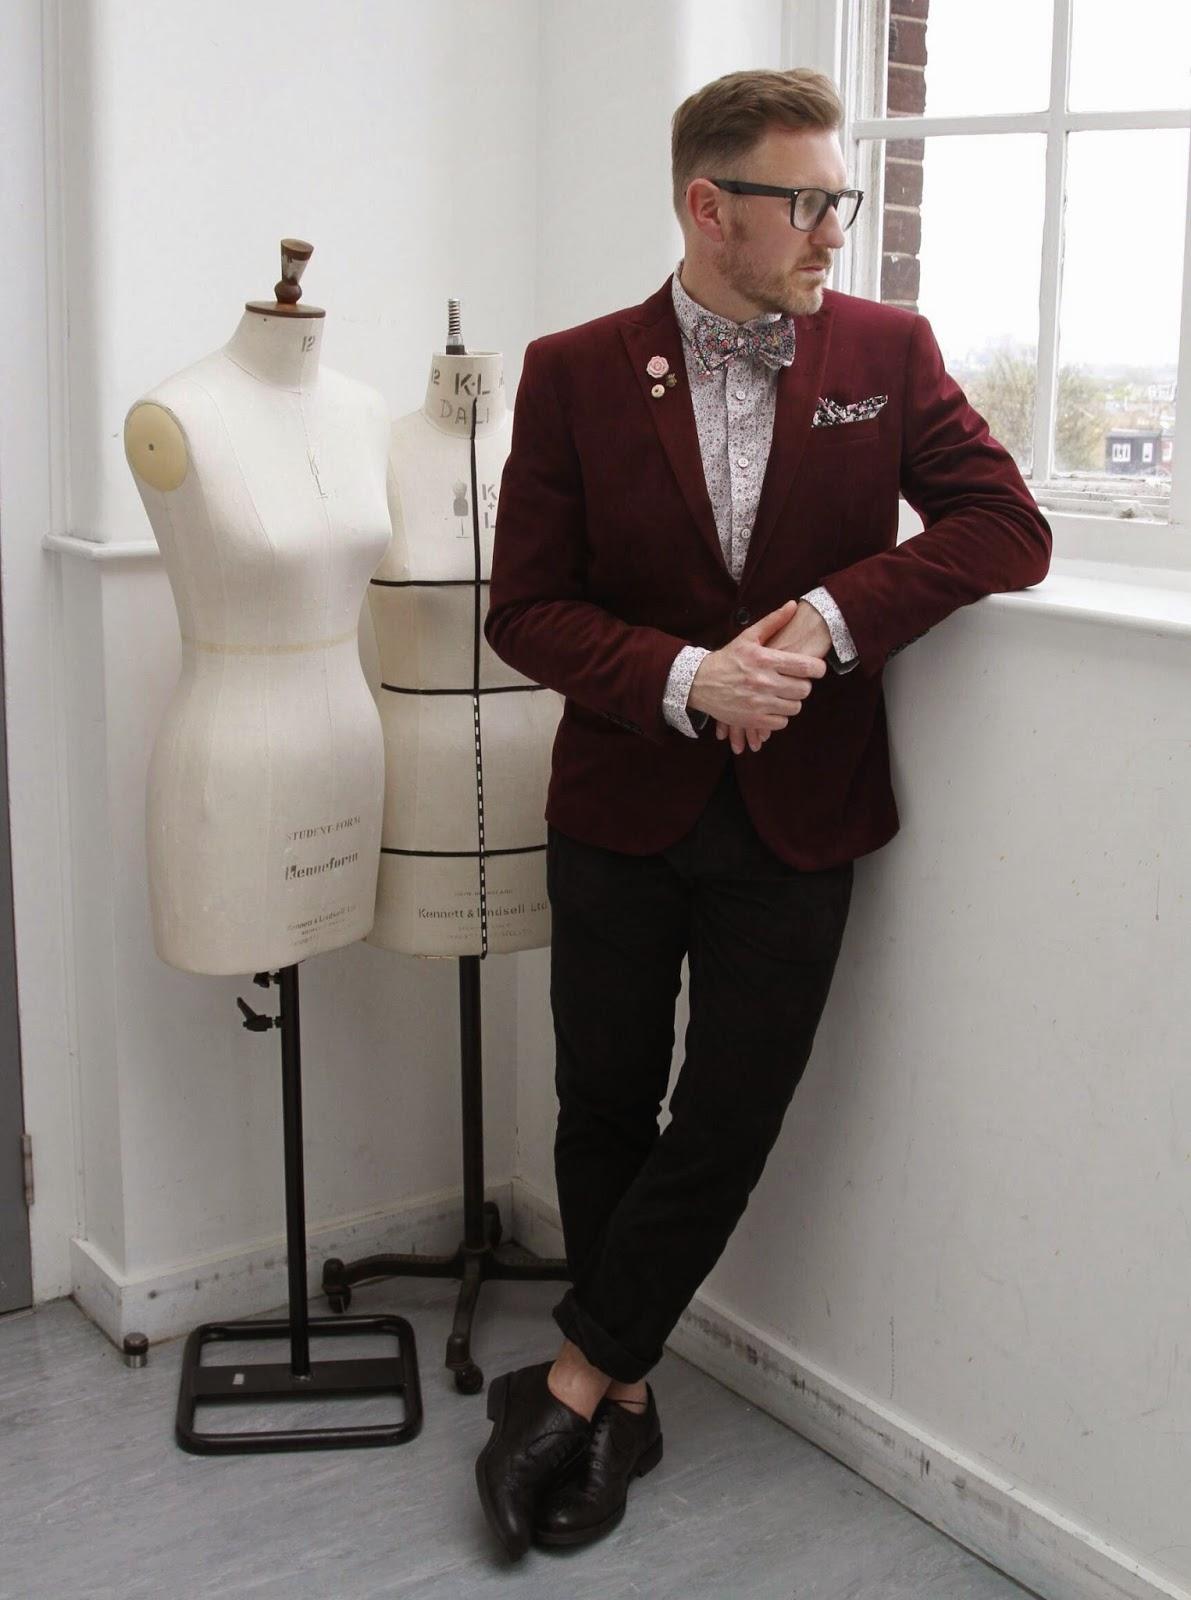 Blogger interviews mens accessory brand The Cordial Churchman